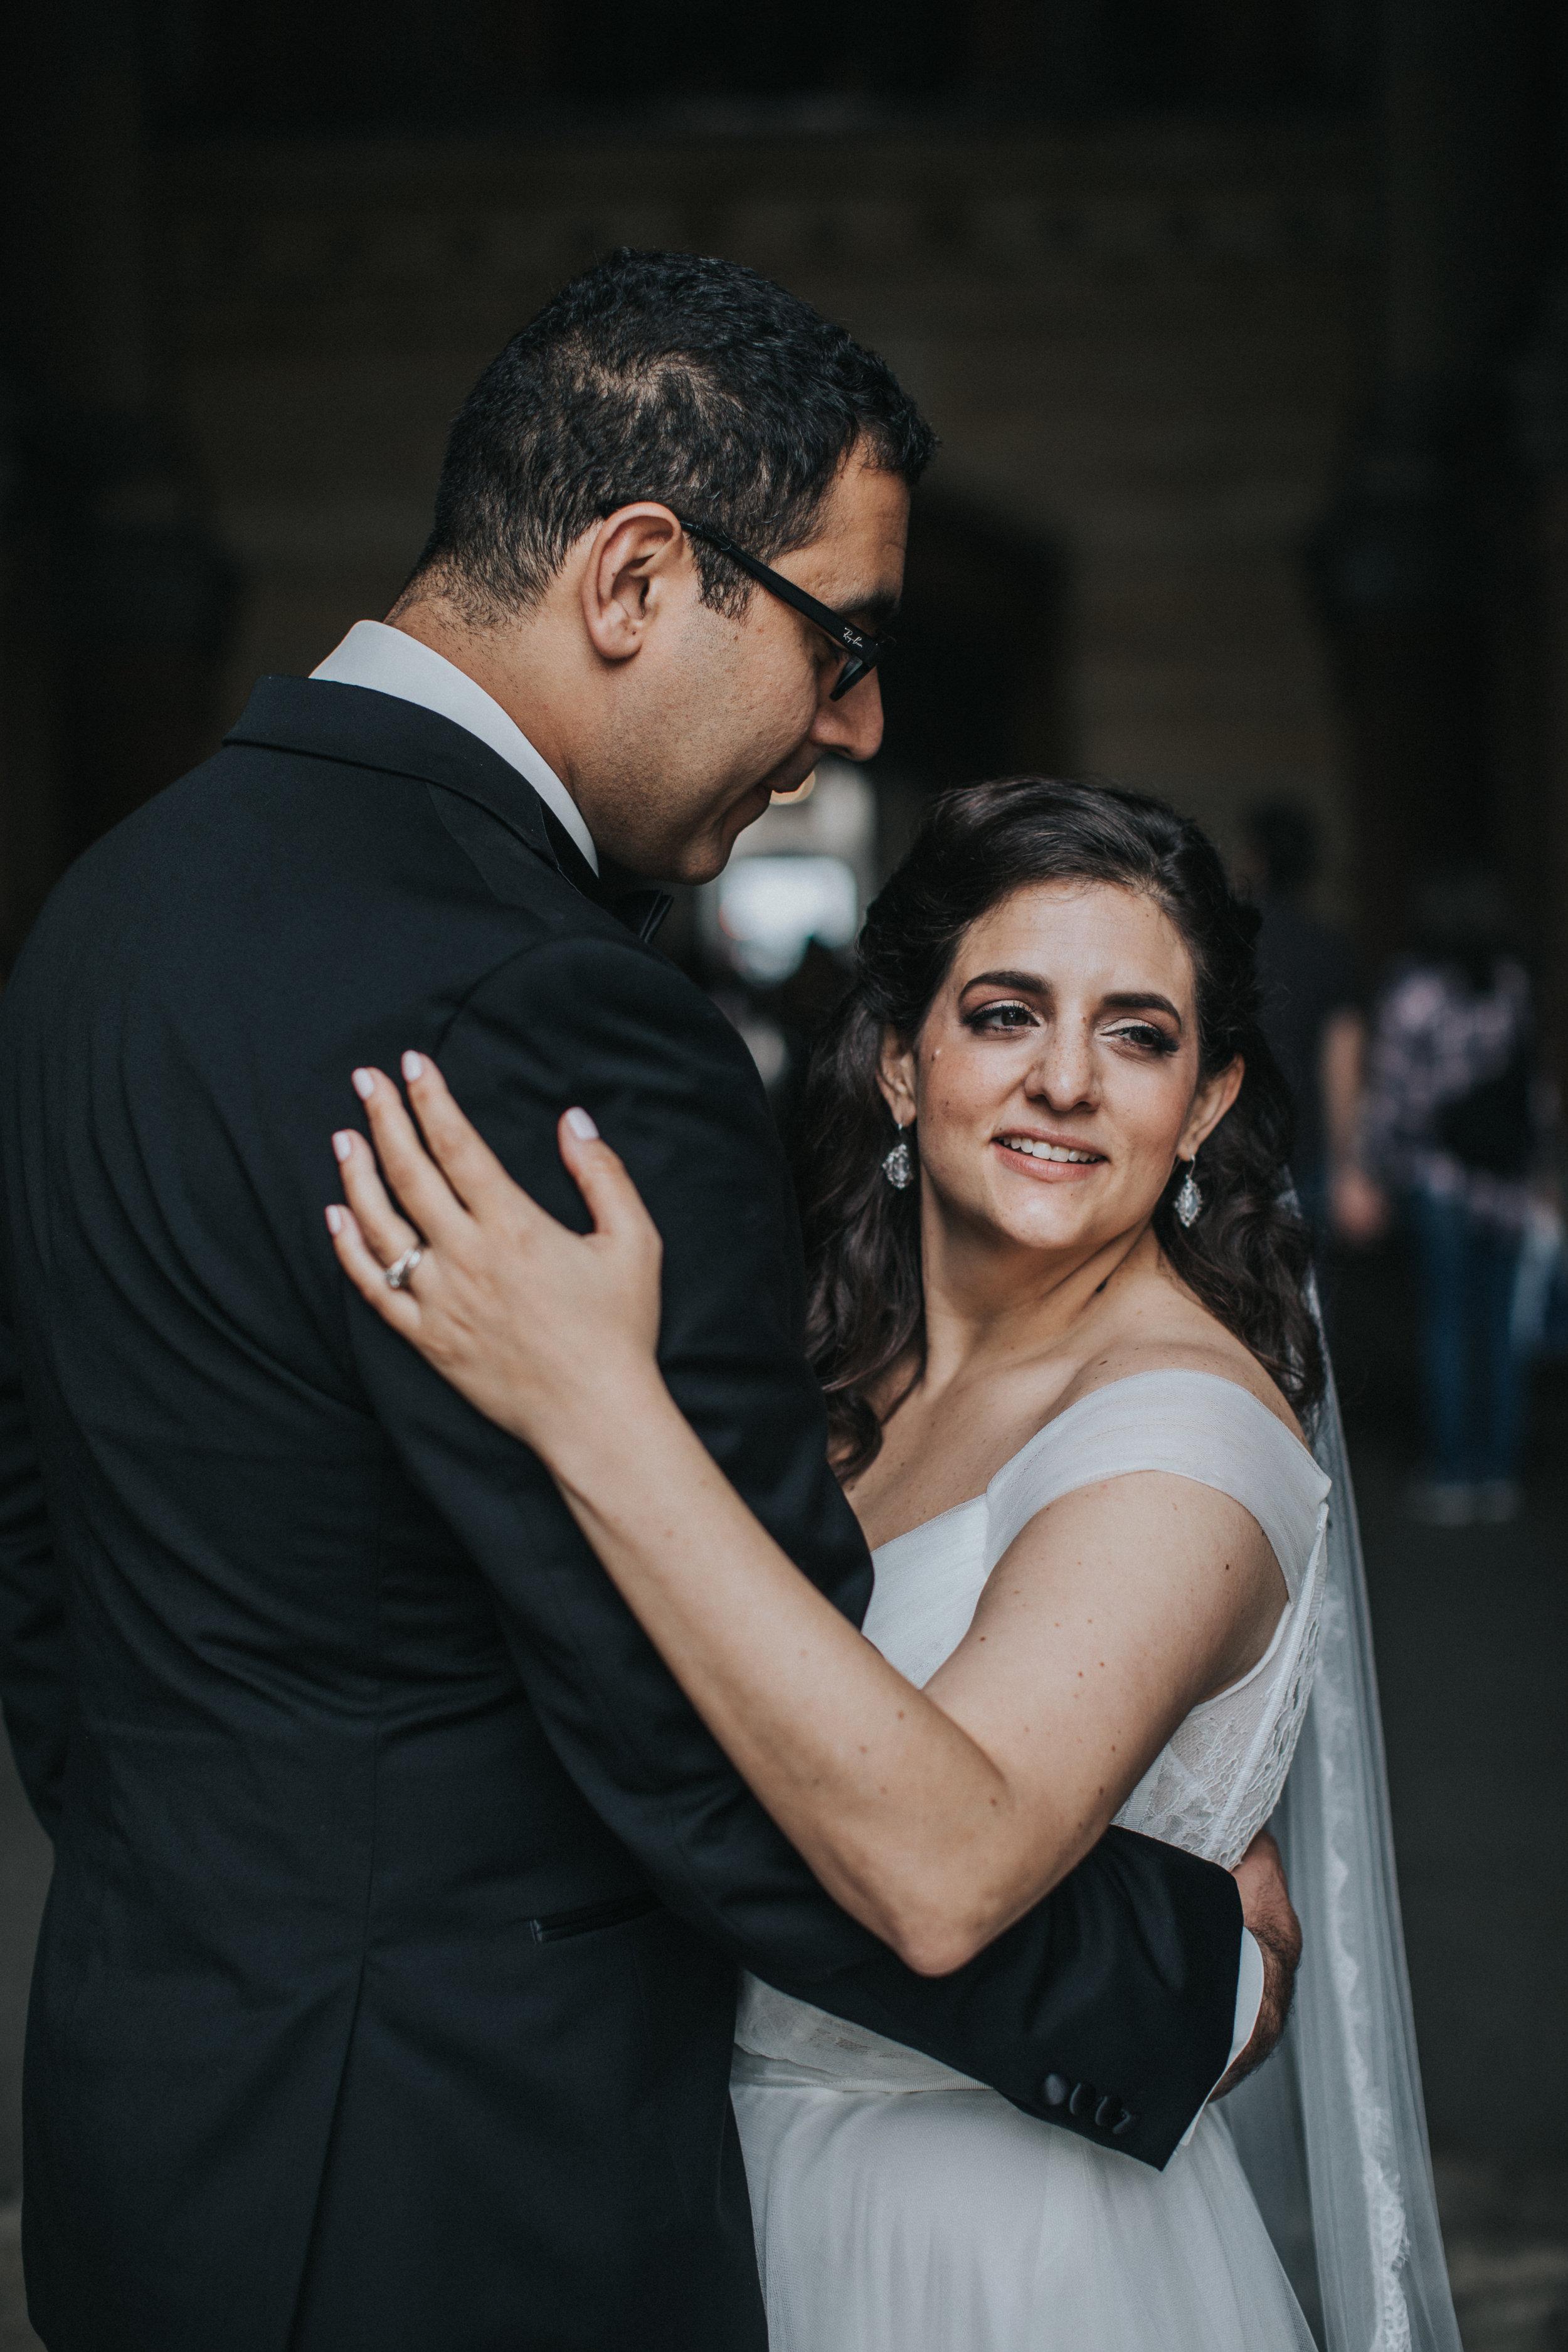 JennaLynnPhotography-NJWeddingPhotographer-Philadelphia-Wedding-ArtsBallroom-BridalParty-25.jpg